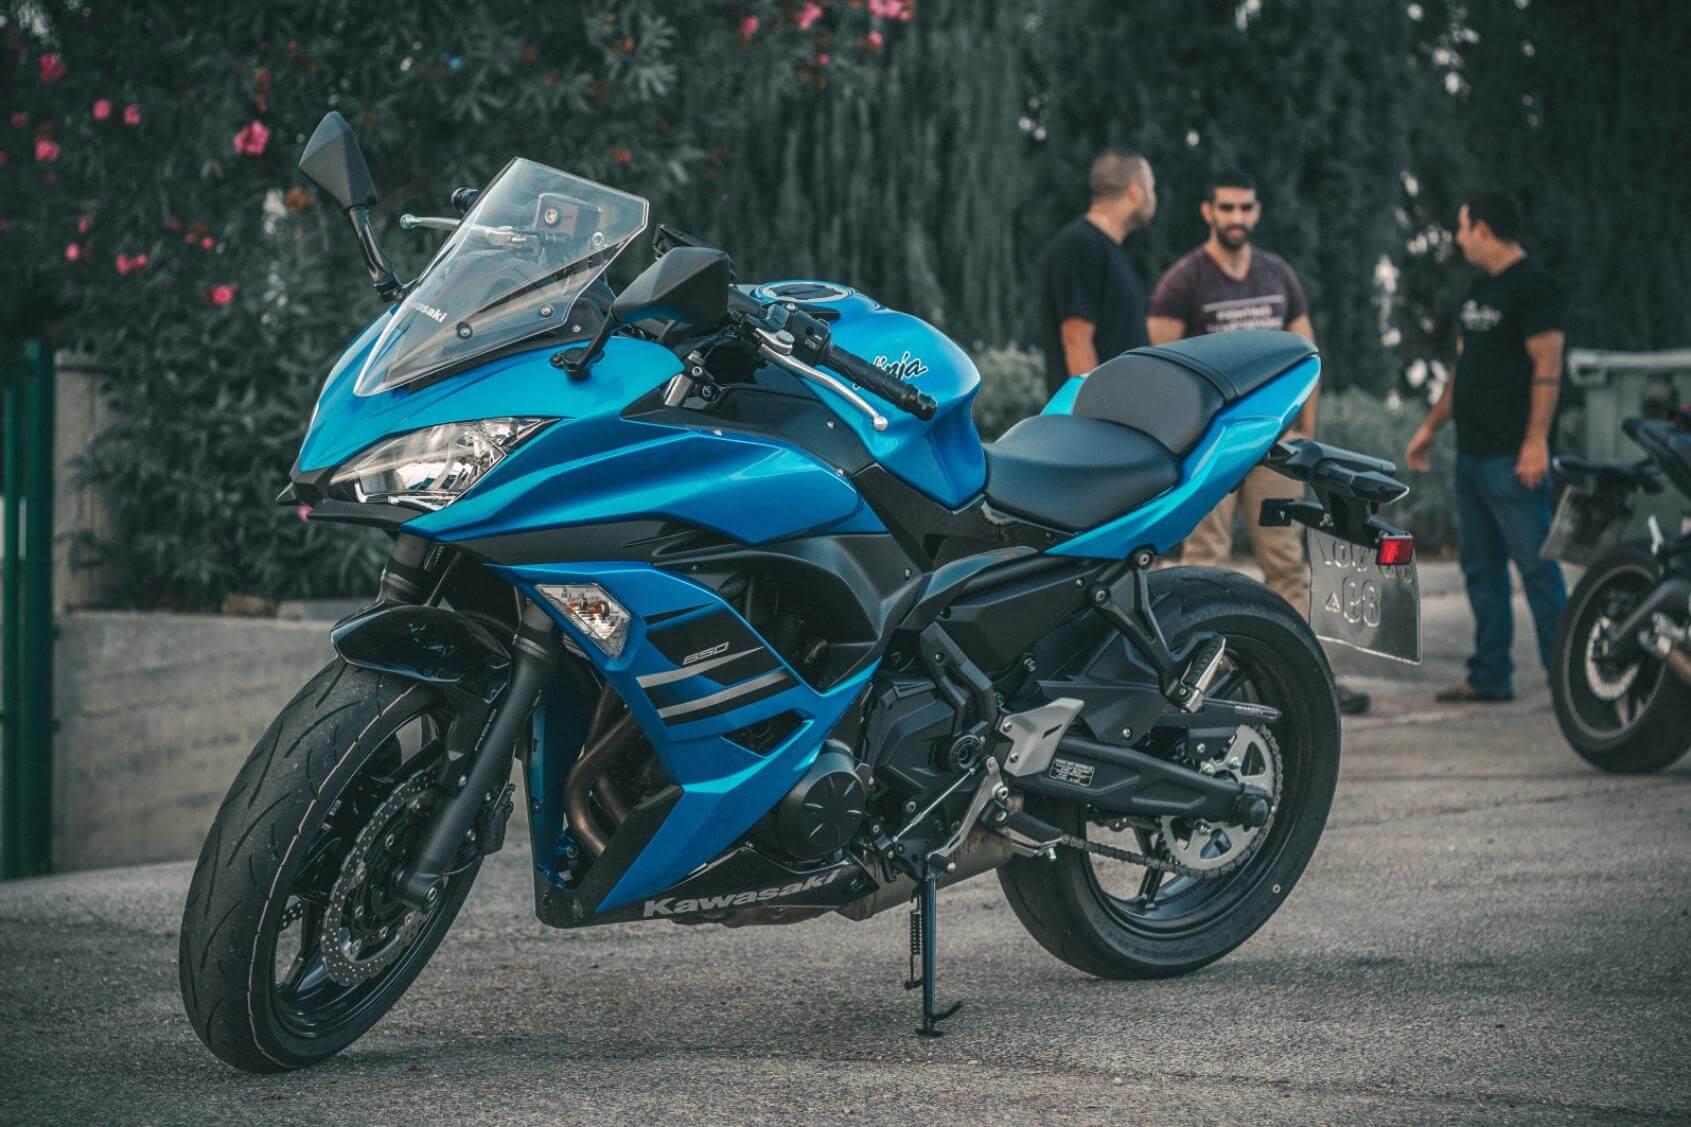 Blue Kawasaki Motorcycle - Original image